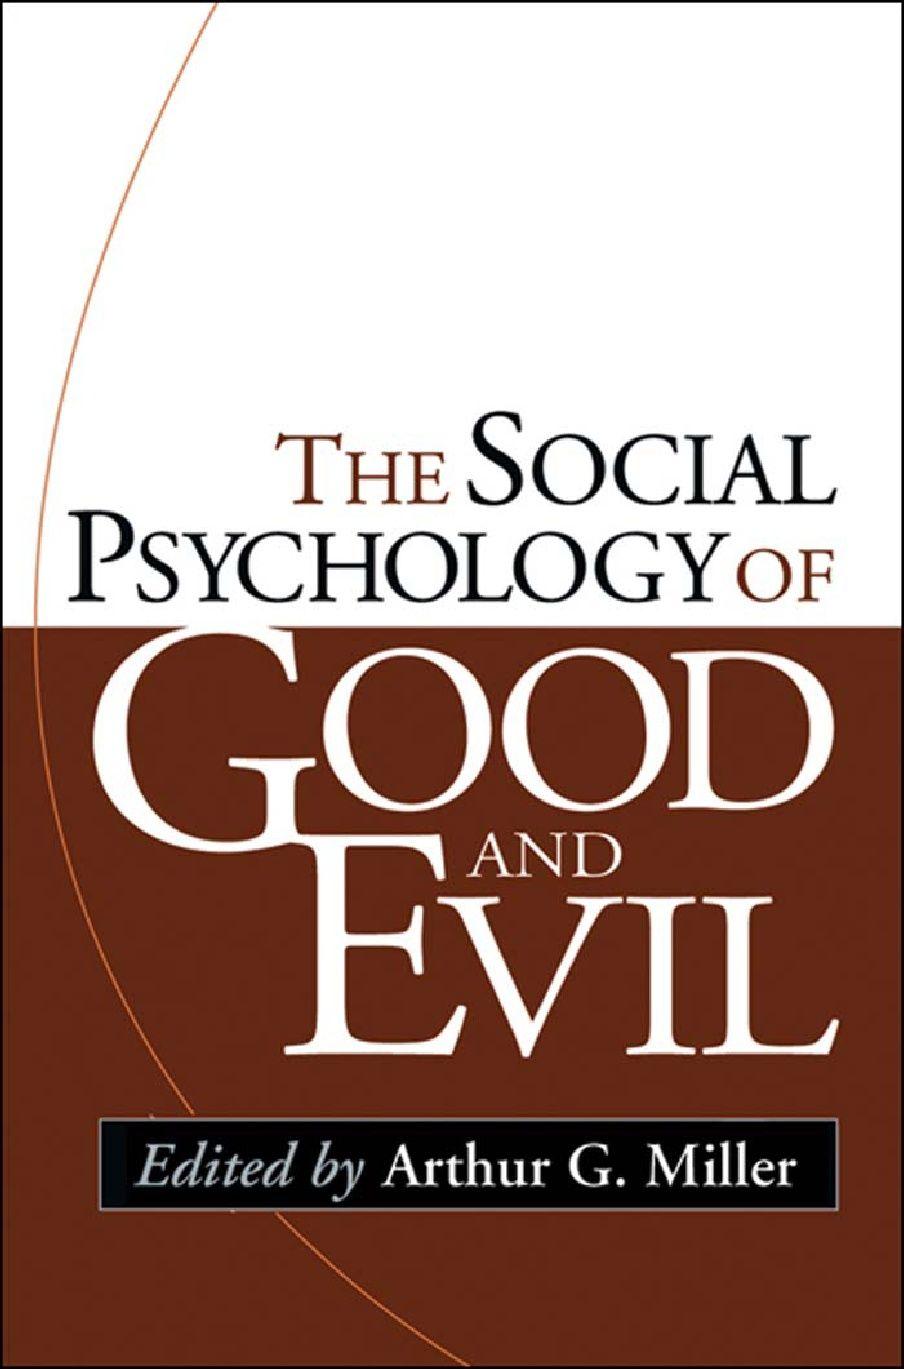 https://www.scribd.com/doc/294220615/The-Social-Psychology-of-Good-and-Evil